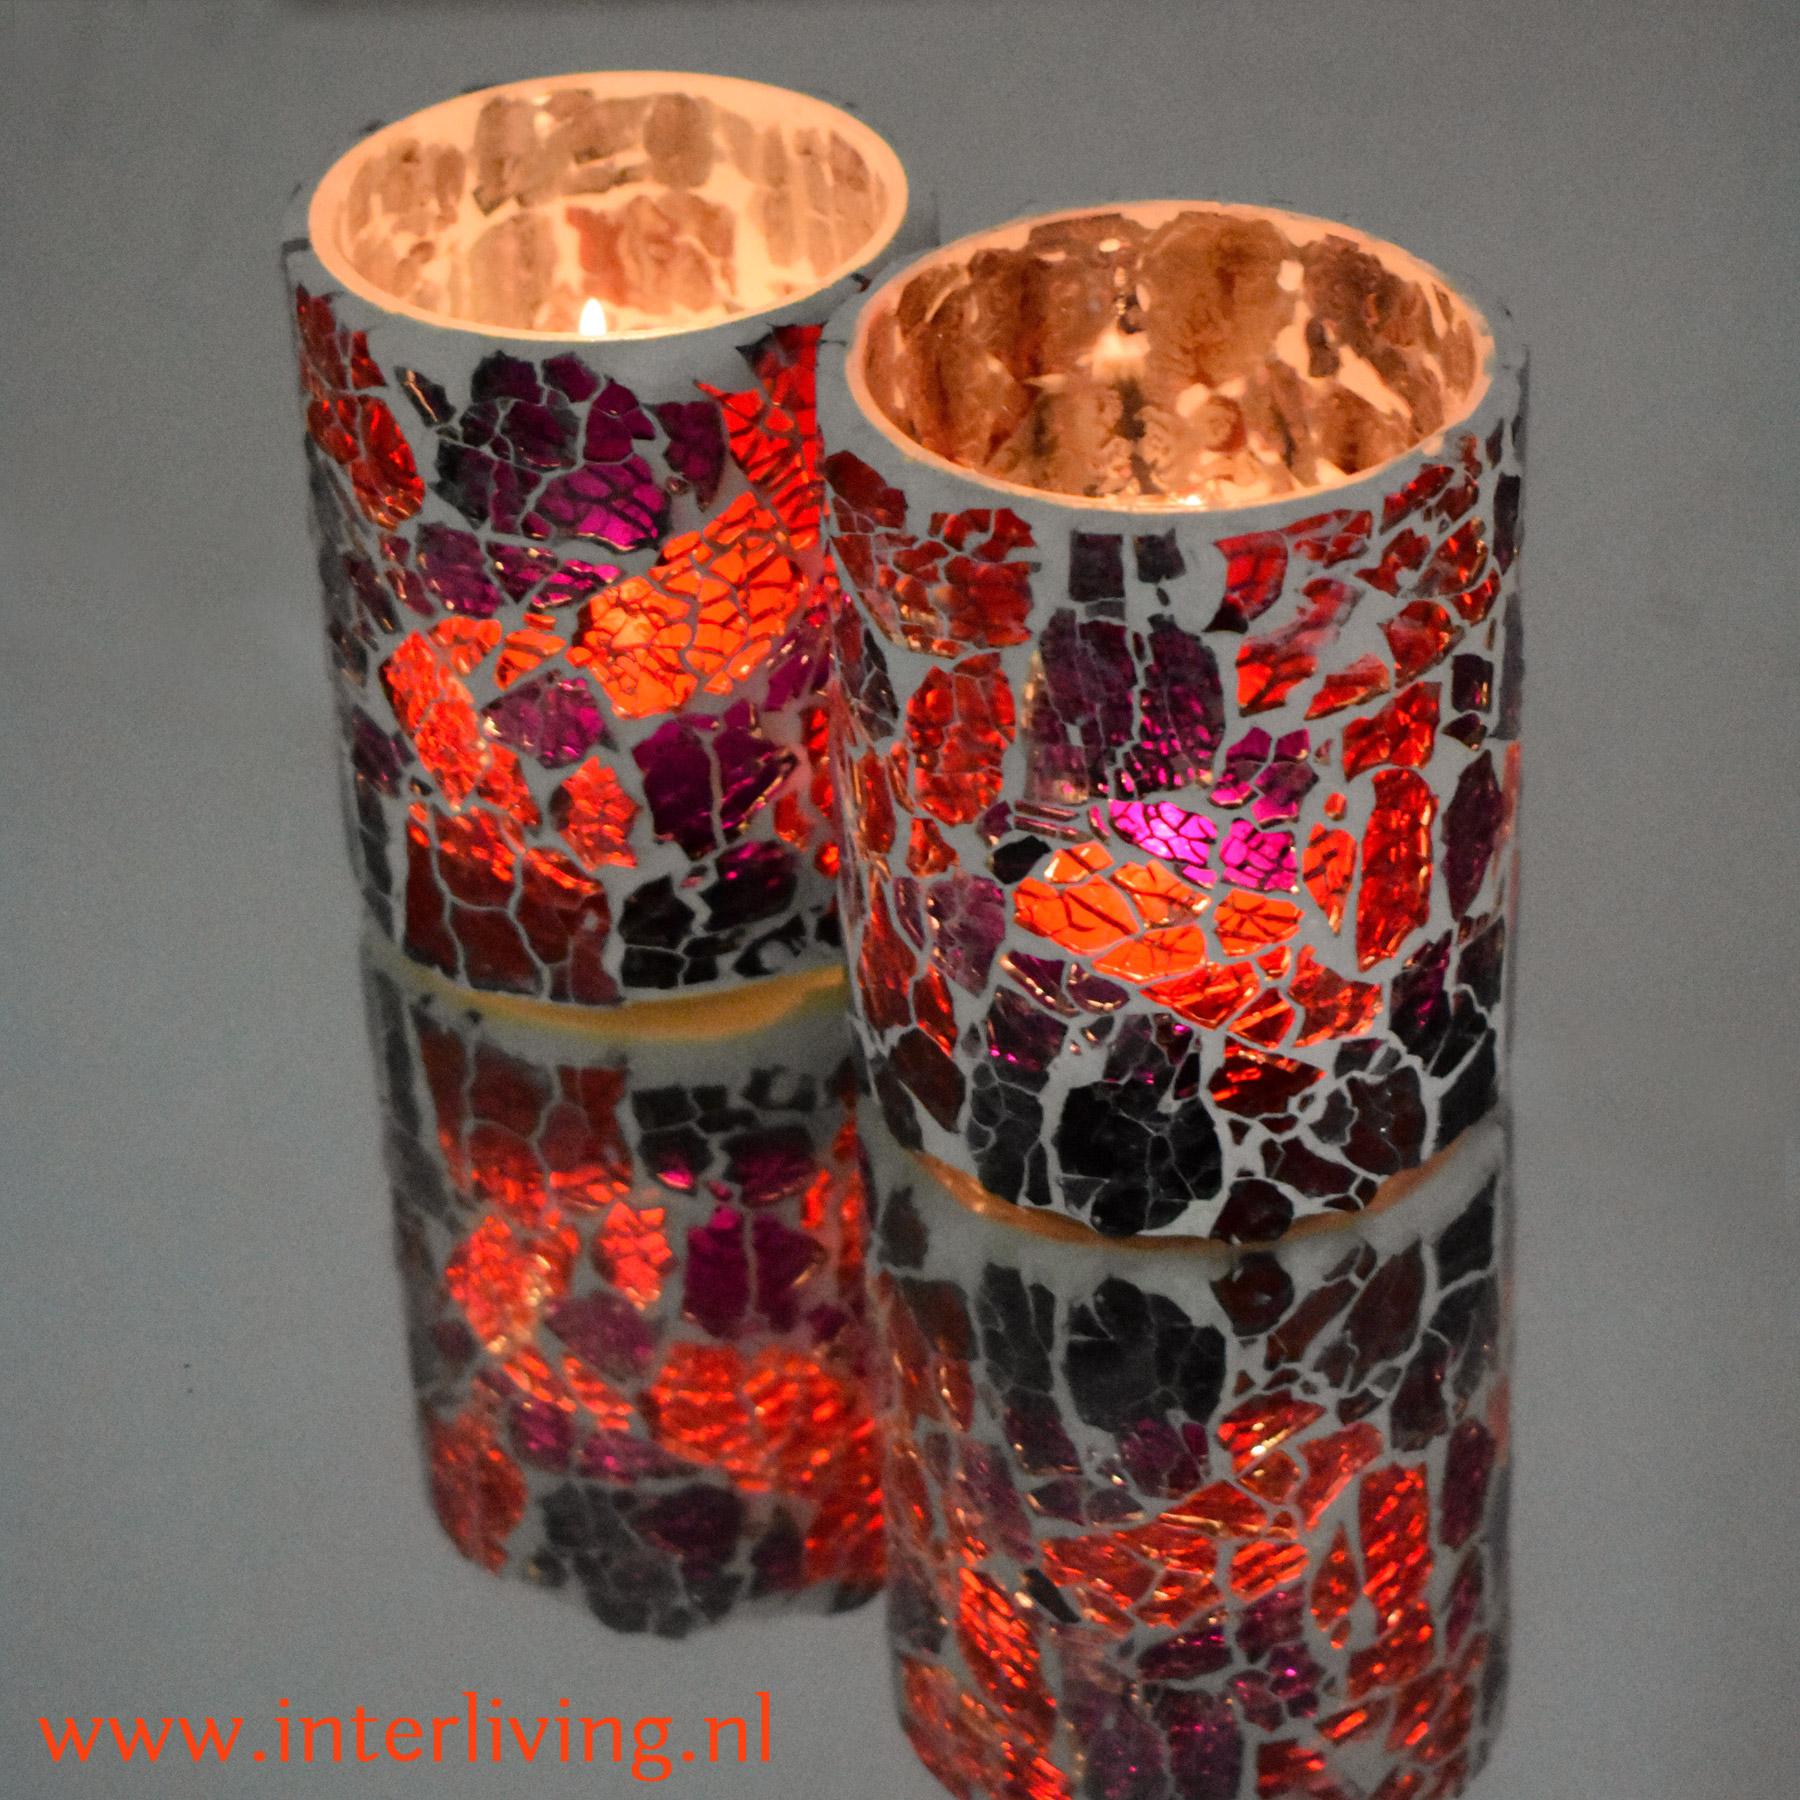 waxinehouders rond - groot cilinder formaat - hippy chic stijl glasmozaïek